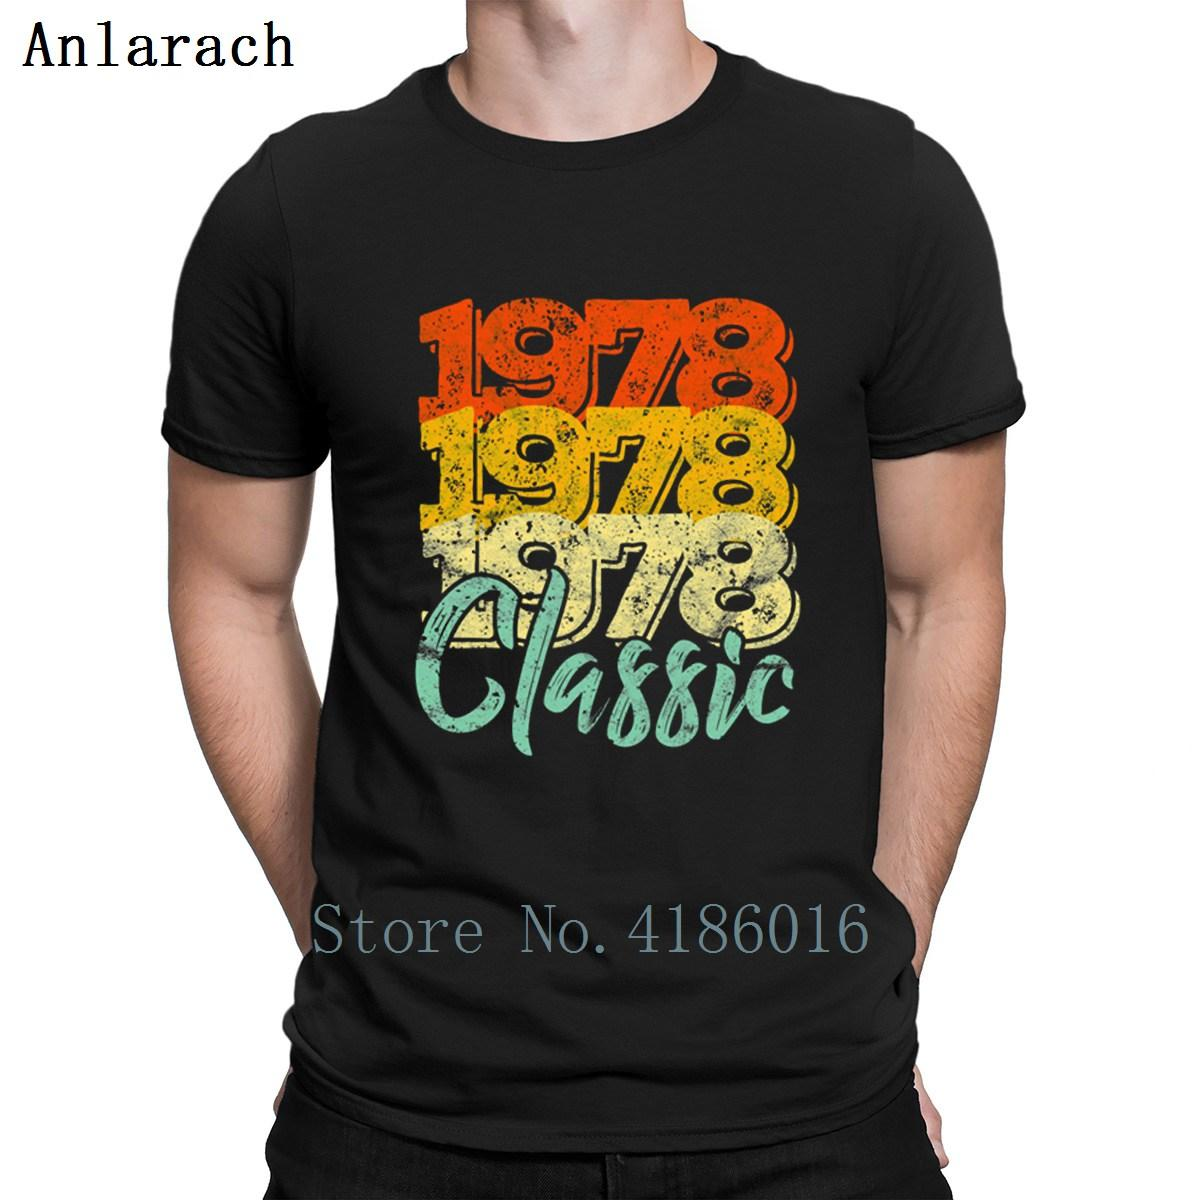 40th Birthday Gift Vintage 1978 Tshirts Graphic Short Sleeve Novelty Designer Men T Shirt 2018 Basic Trend Hiphop Top Round Neck Cute Shirts Nerd